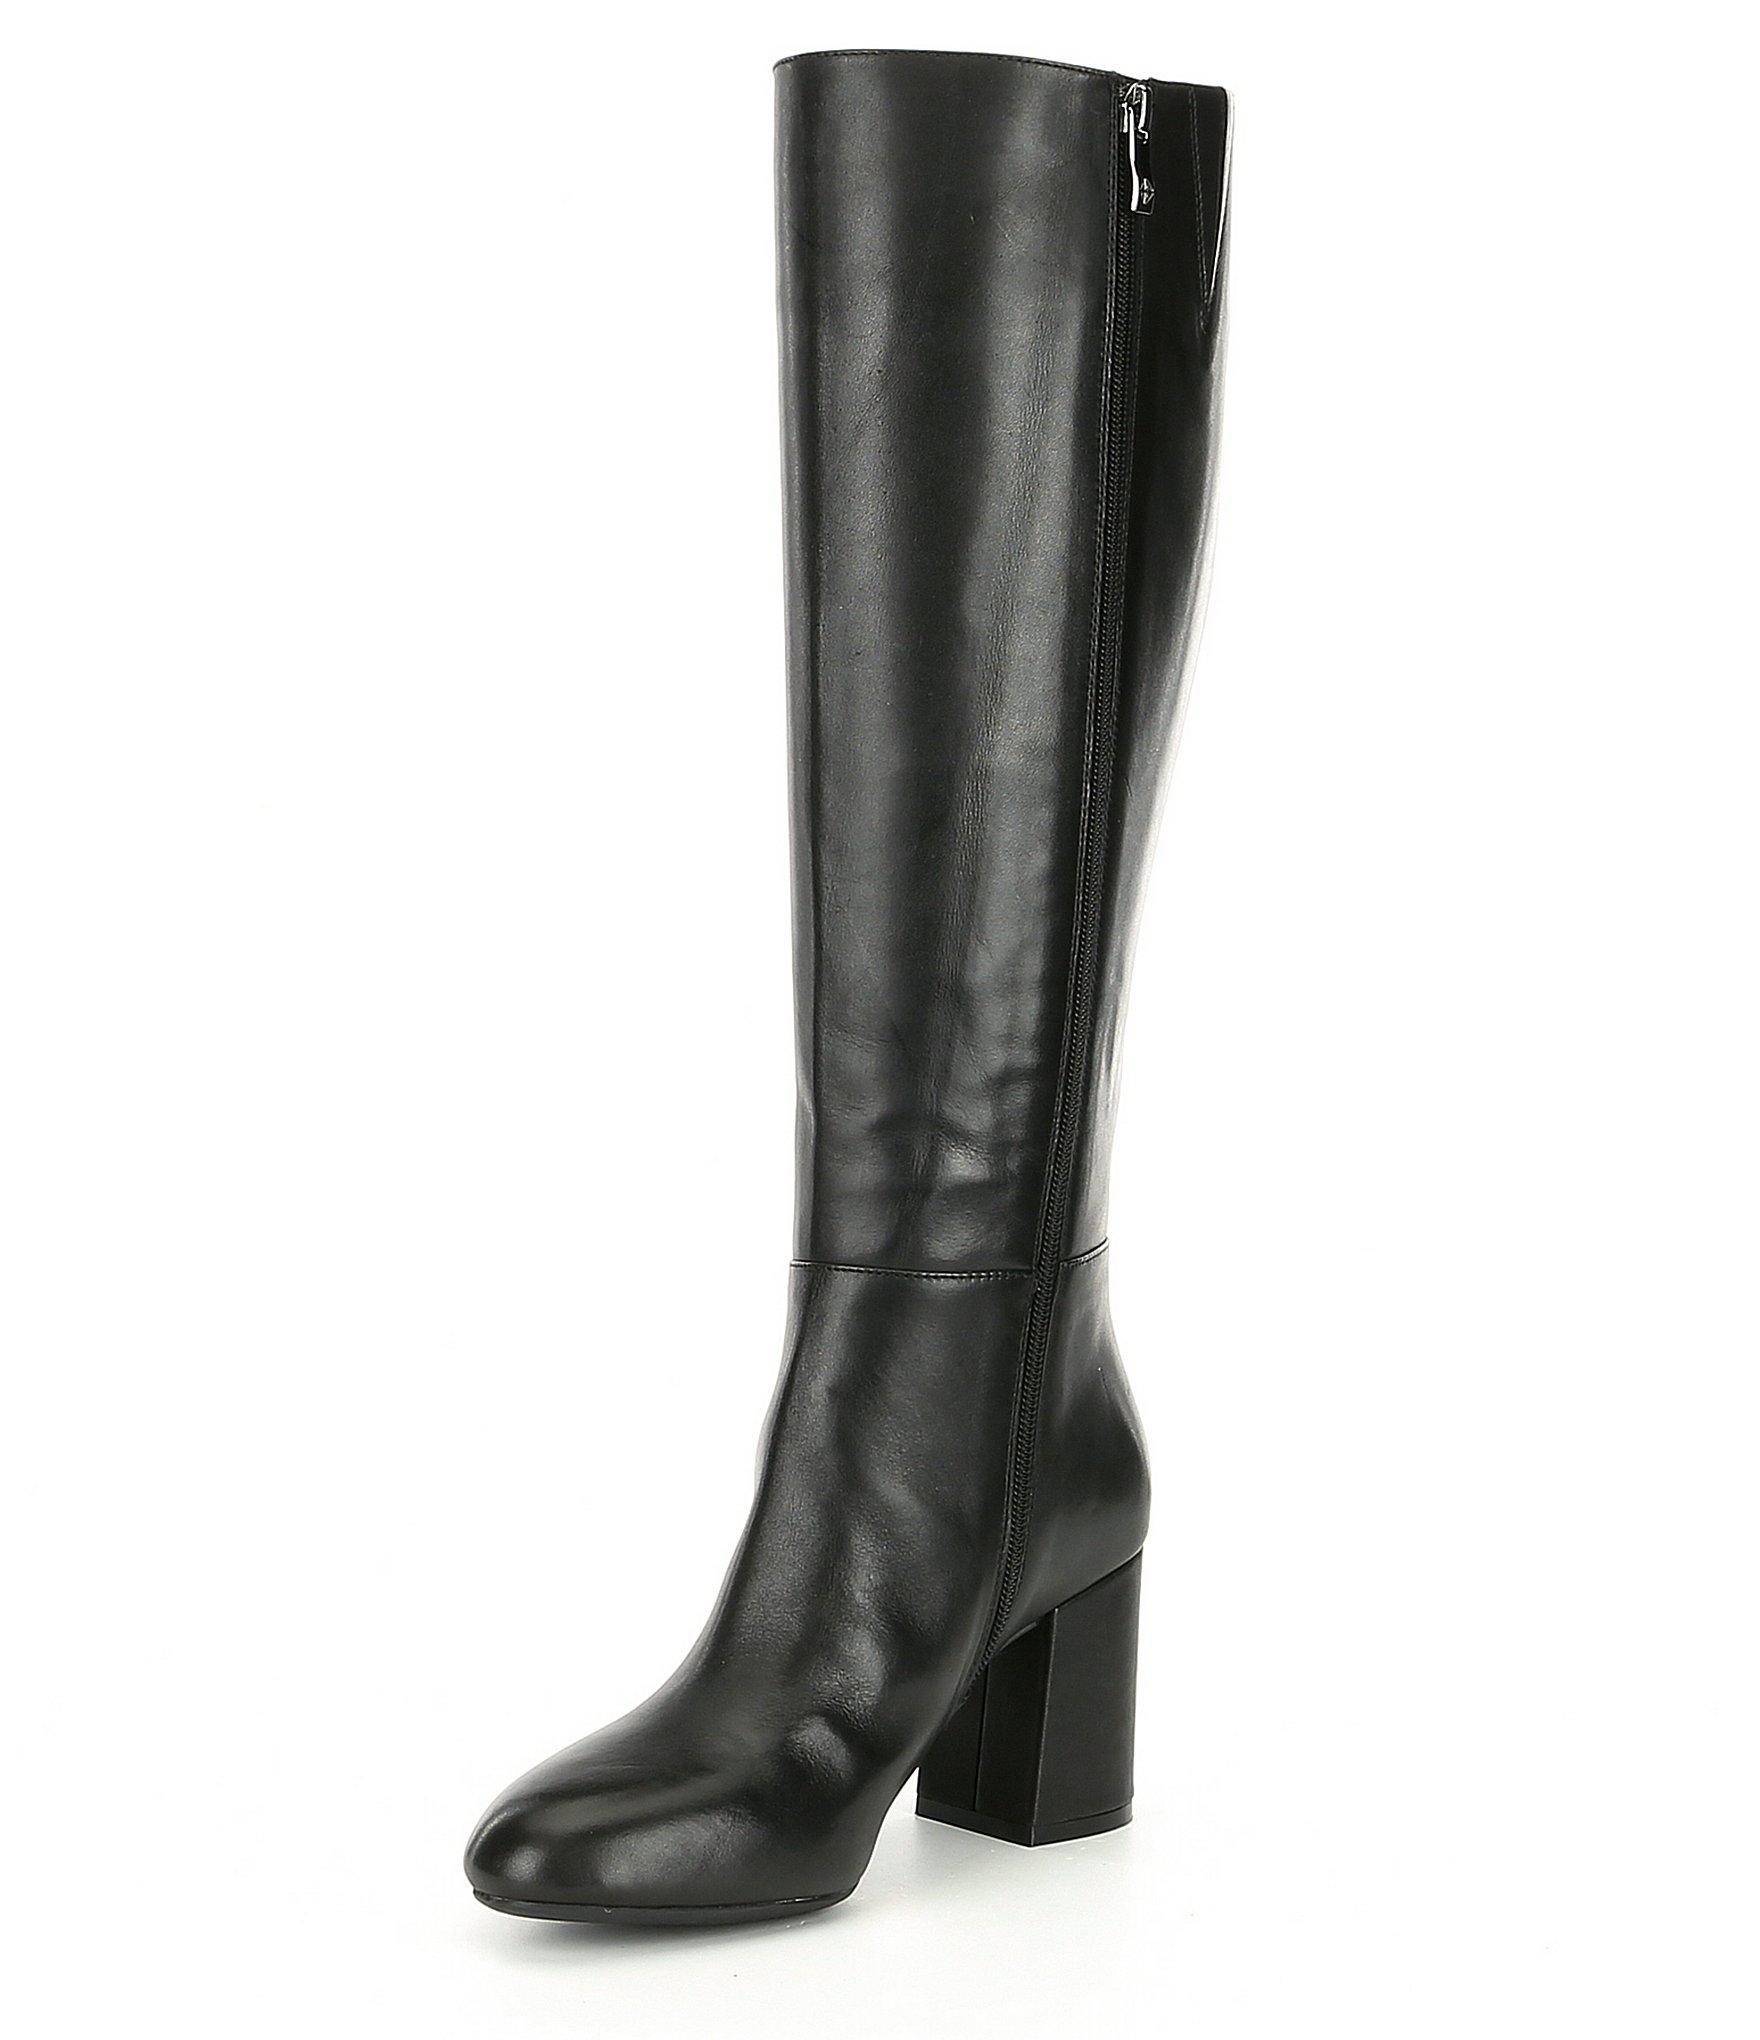 latest design cheap price on feet shots of Antonio Melani Bretal Narrow Calf Tall Block Heel Boots in Black ...